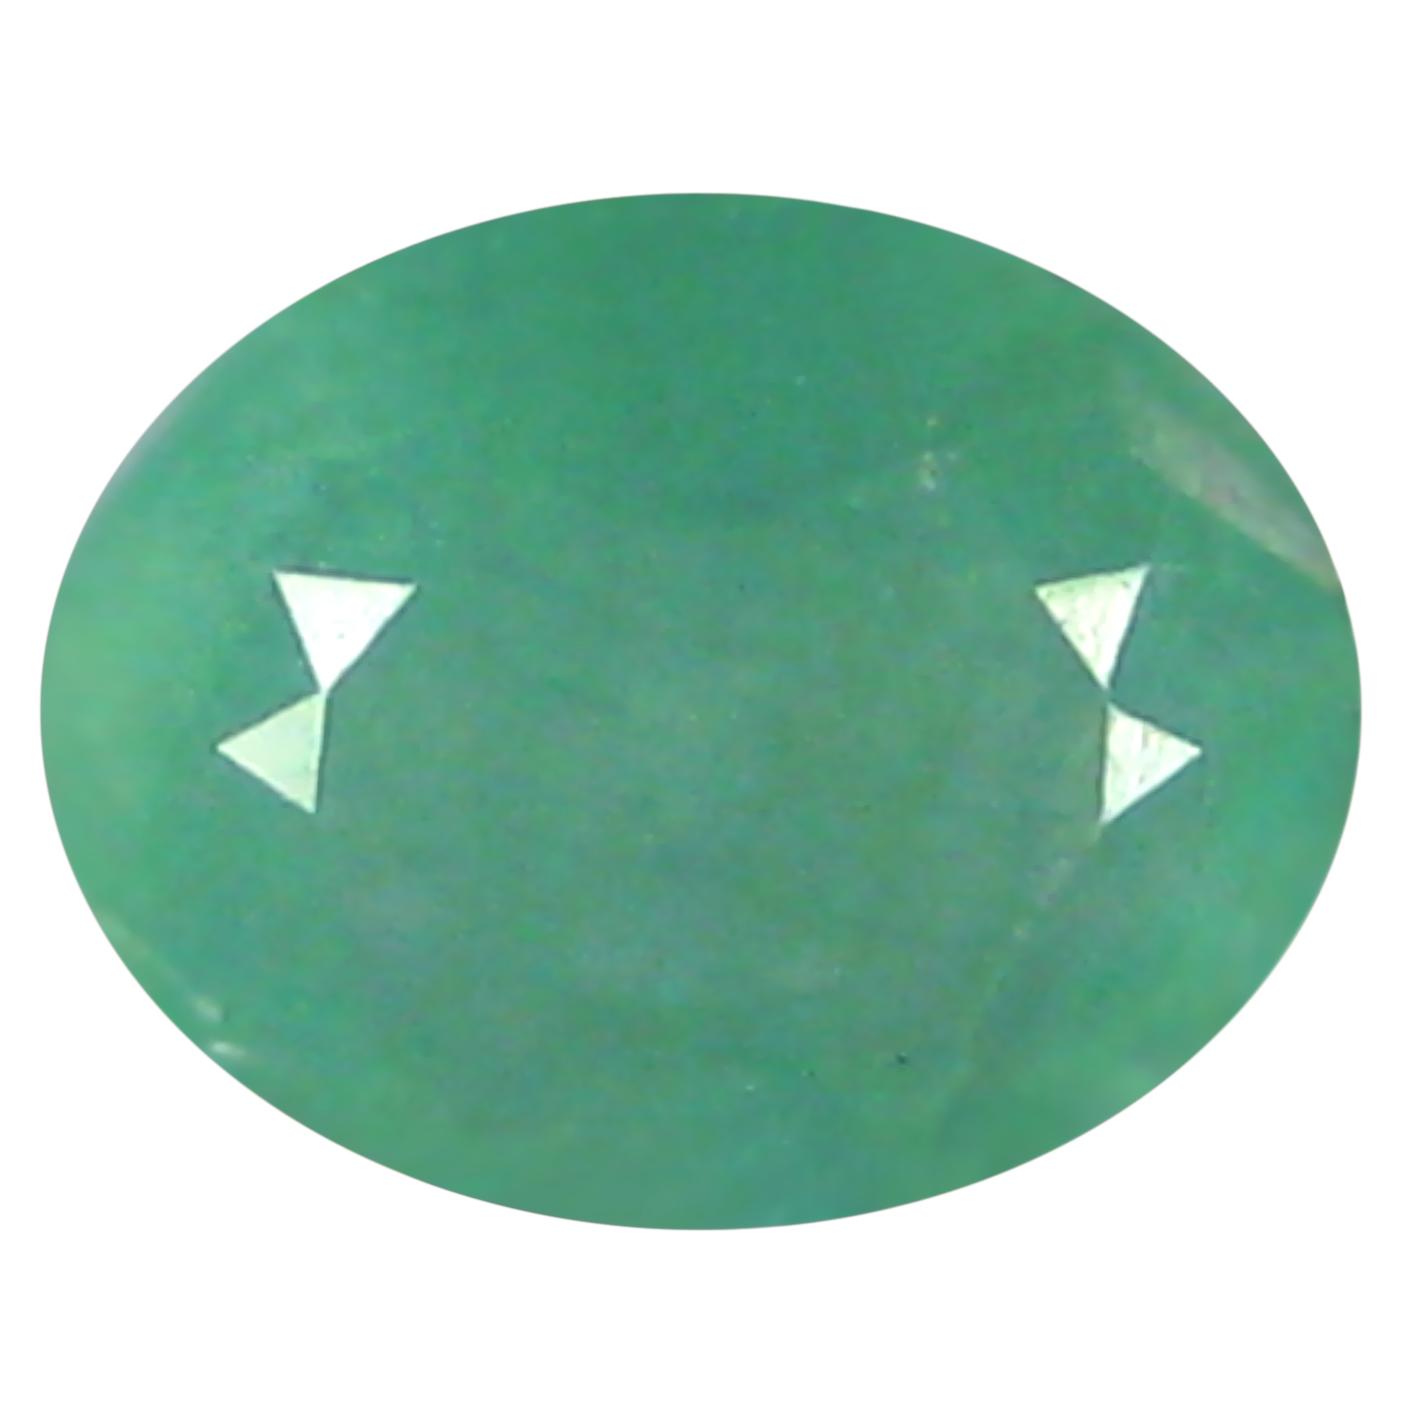 0.61 ct  Fabulous Oval Shape (6 x 5 mm) Bluish Green Grandidierite Natural Gemstone